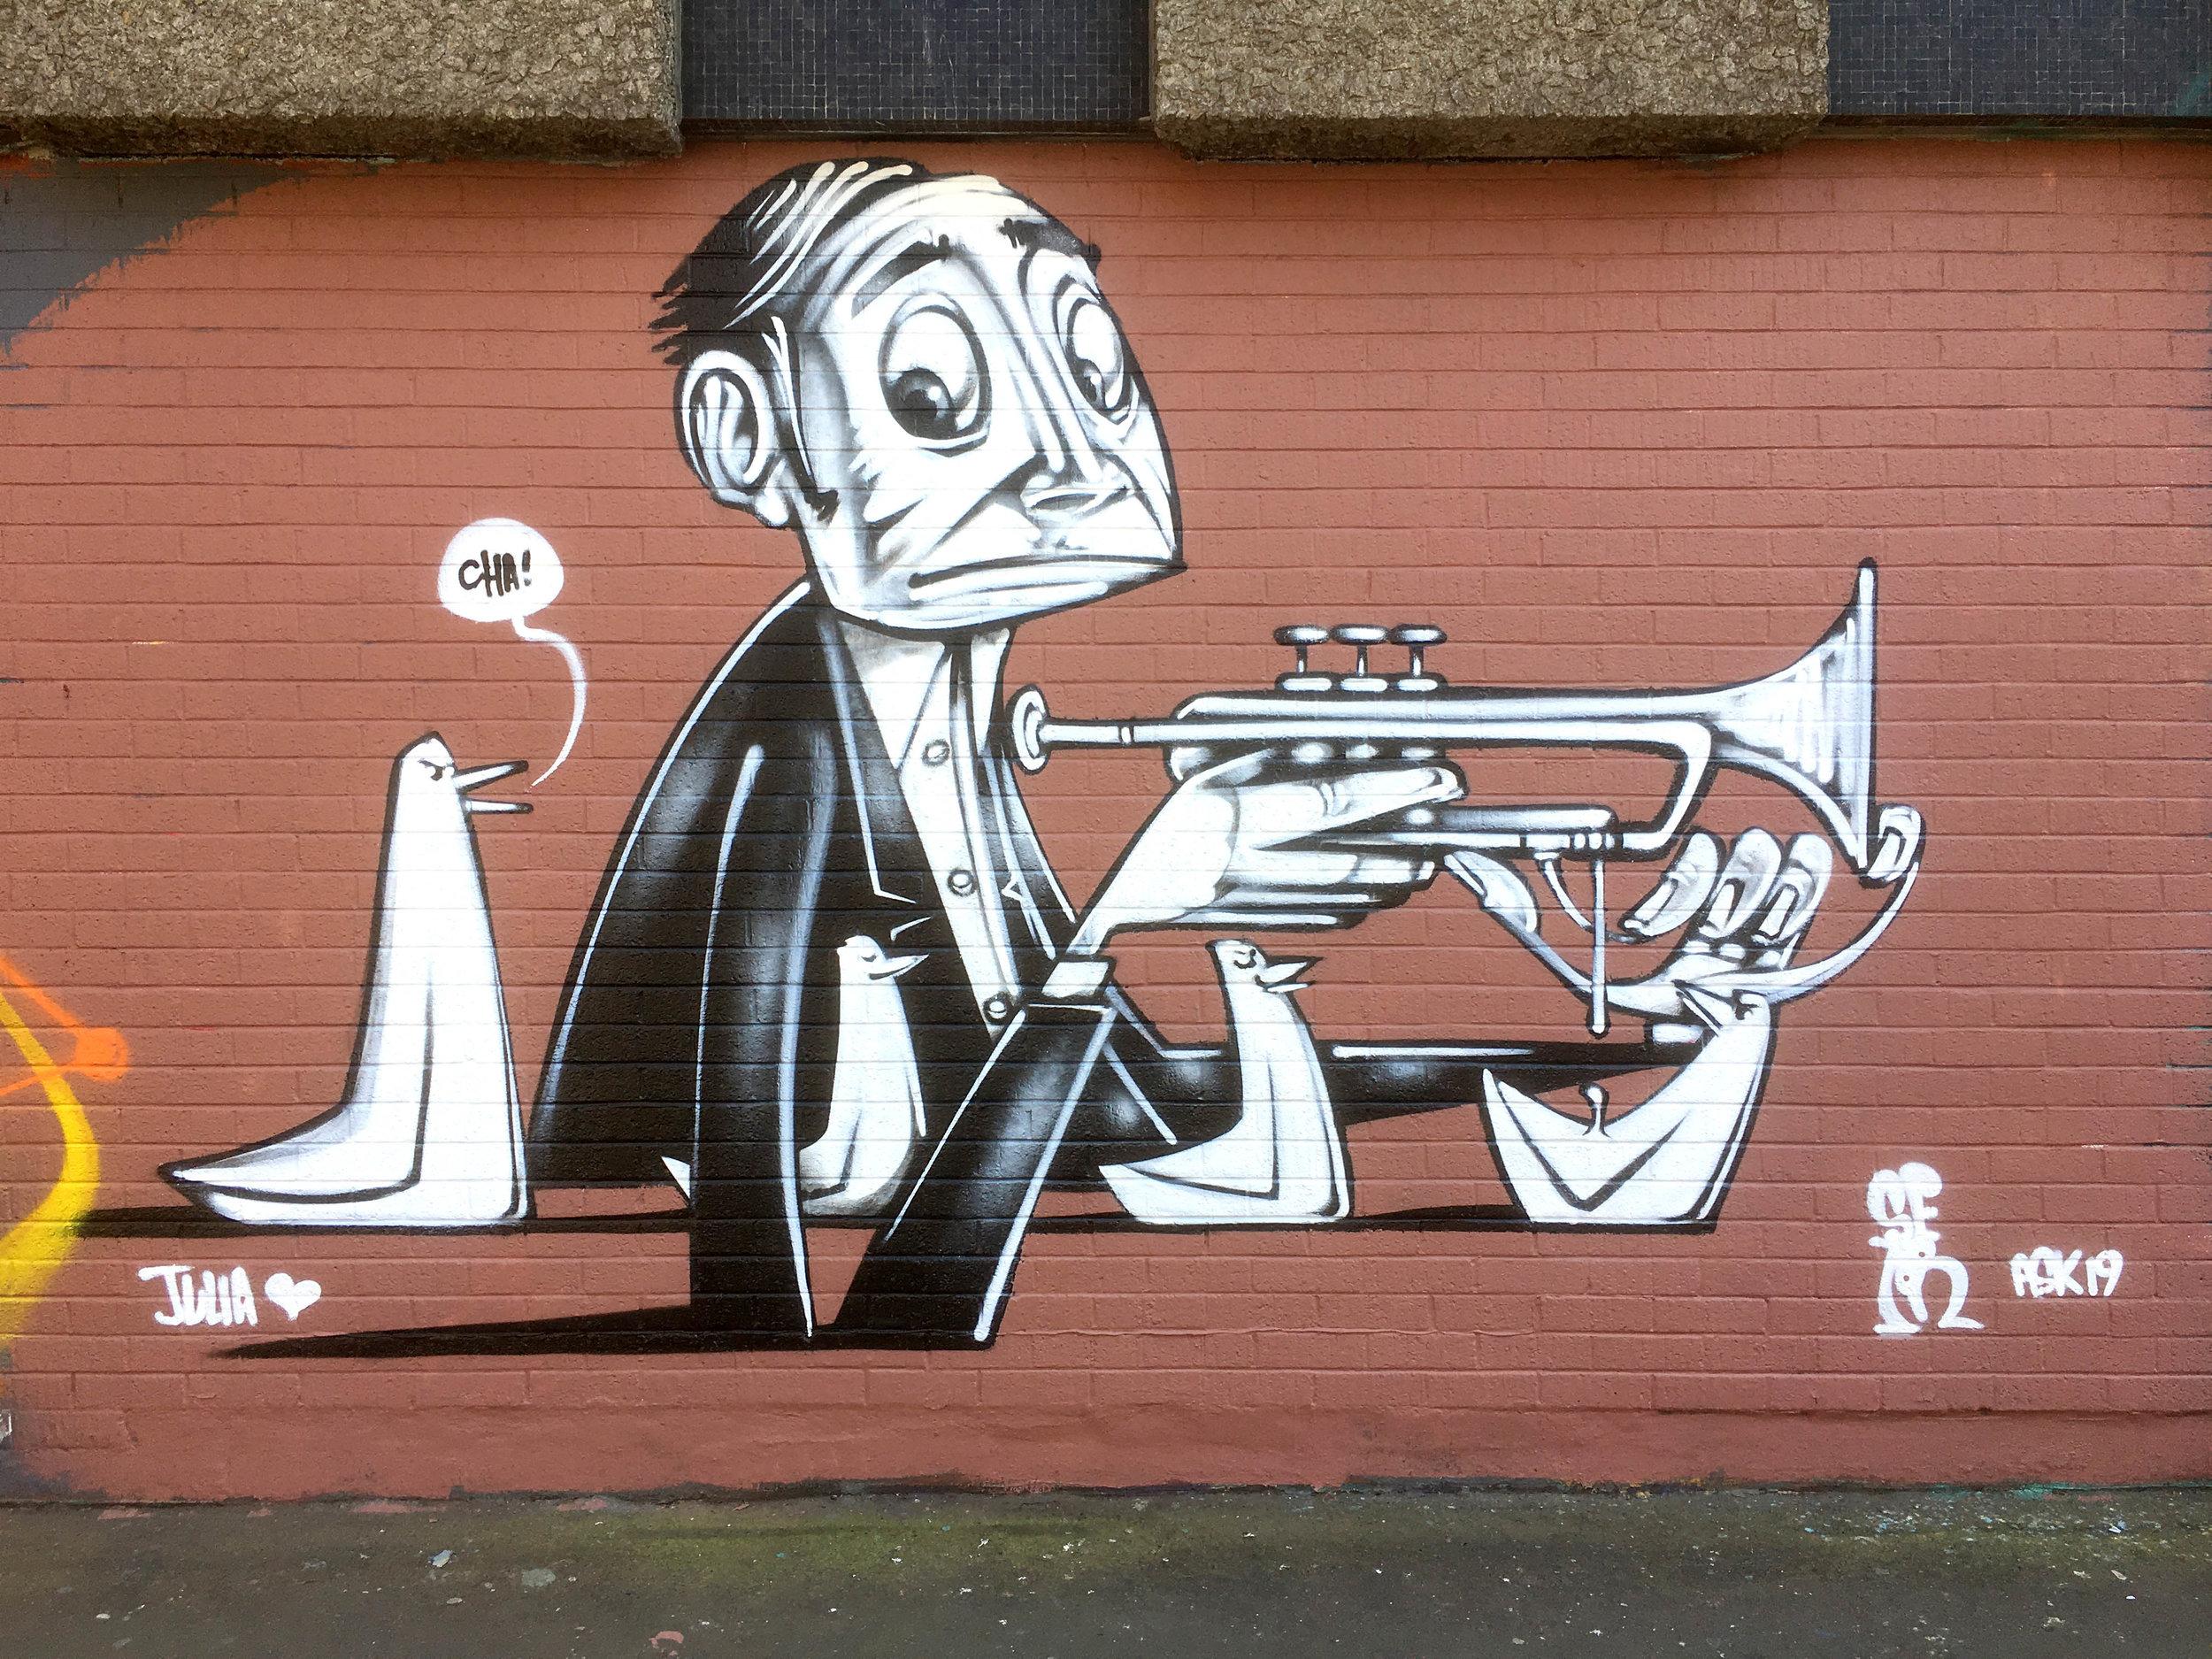 Bristol '19